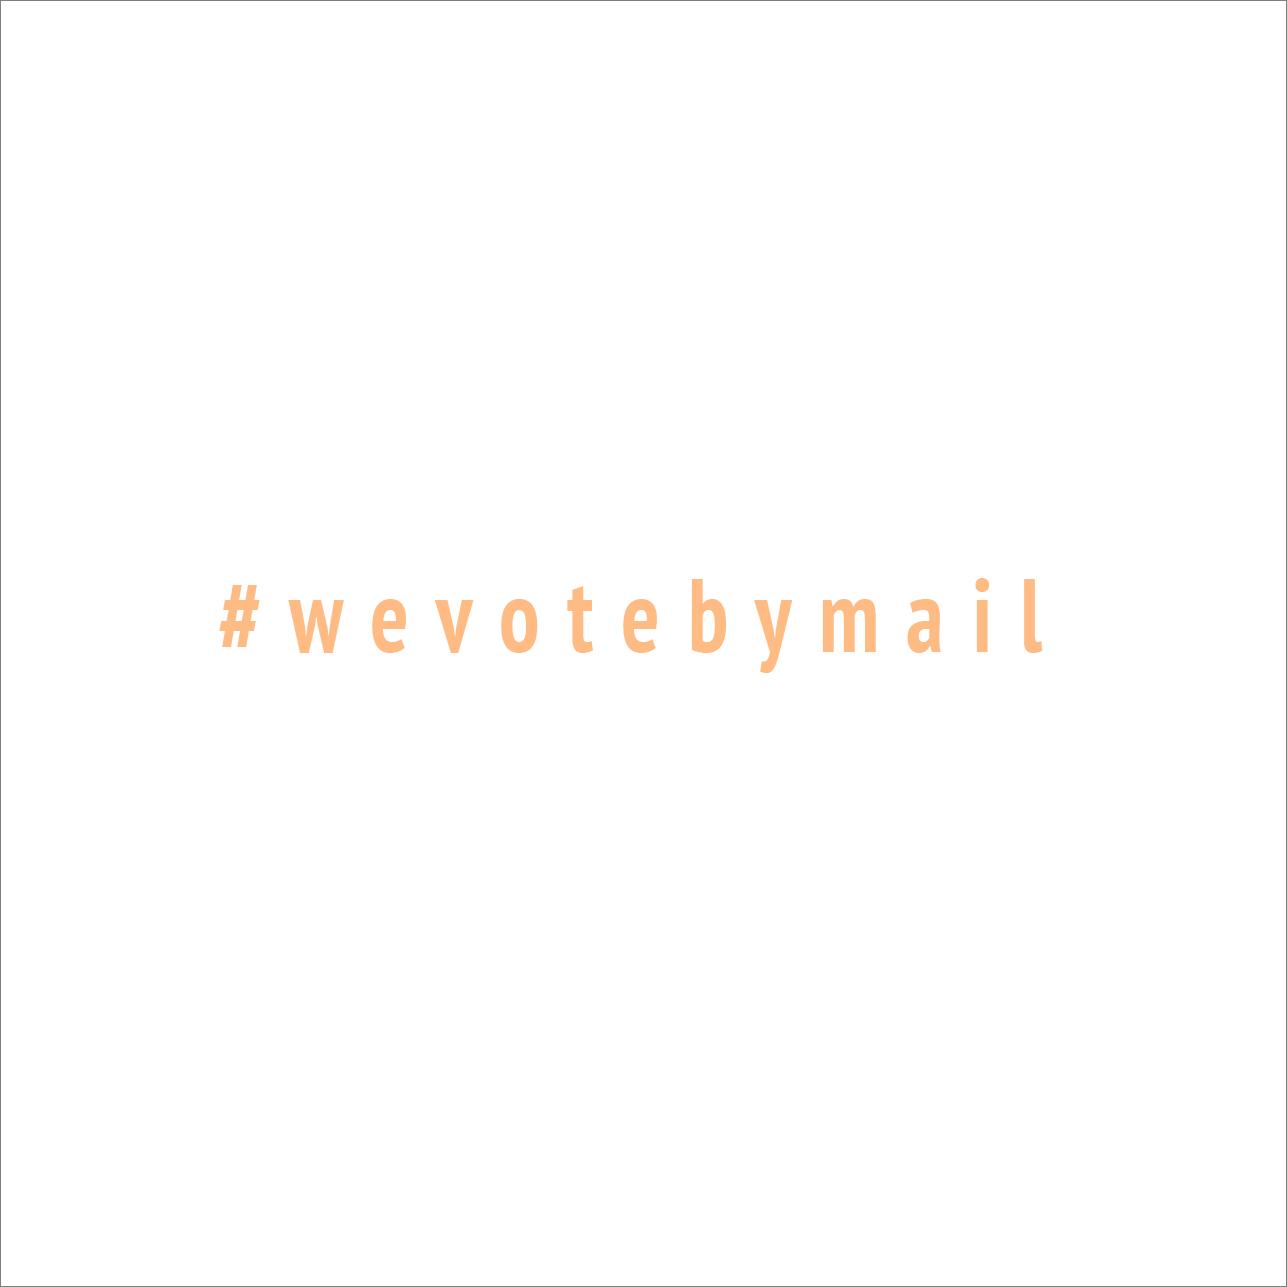 #wevotebymail (white)